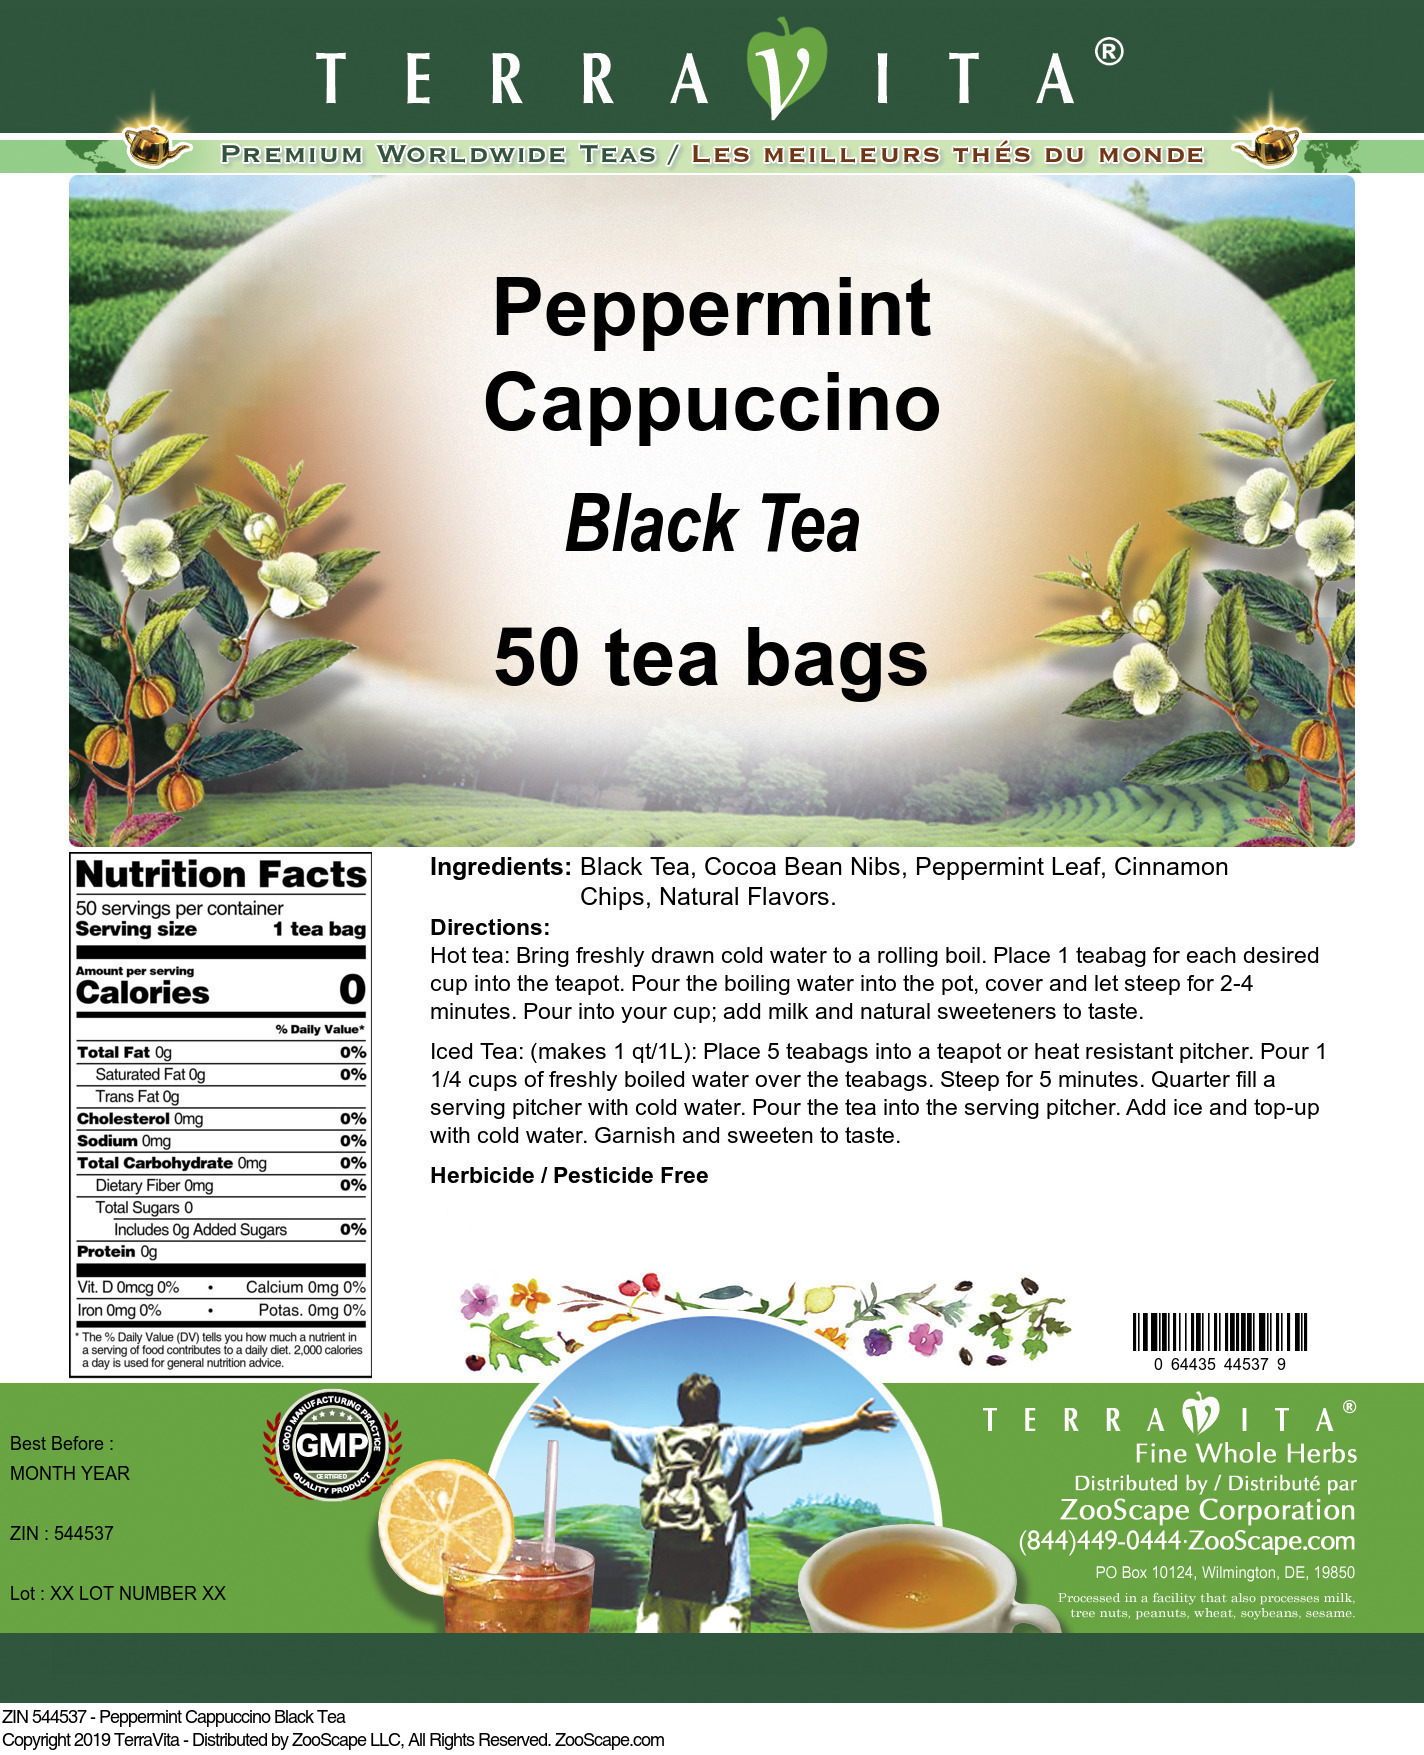 Peppermint Cappuccino Black Tea